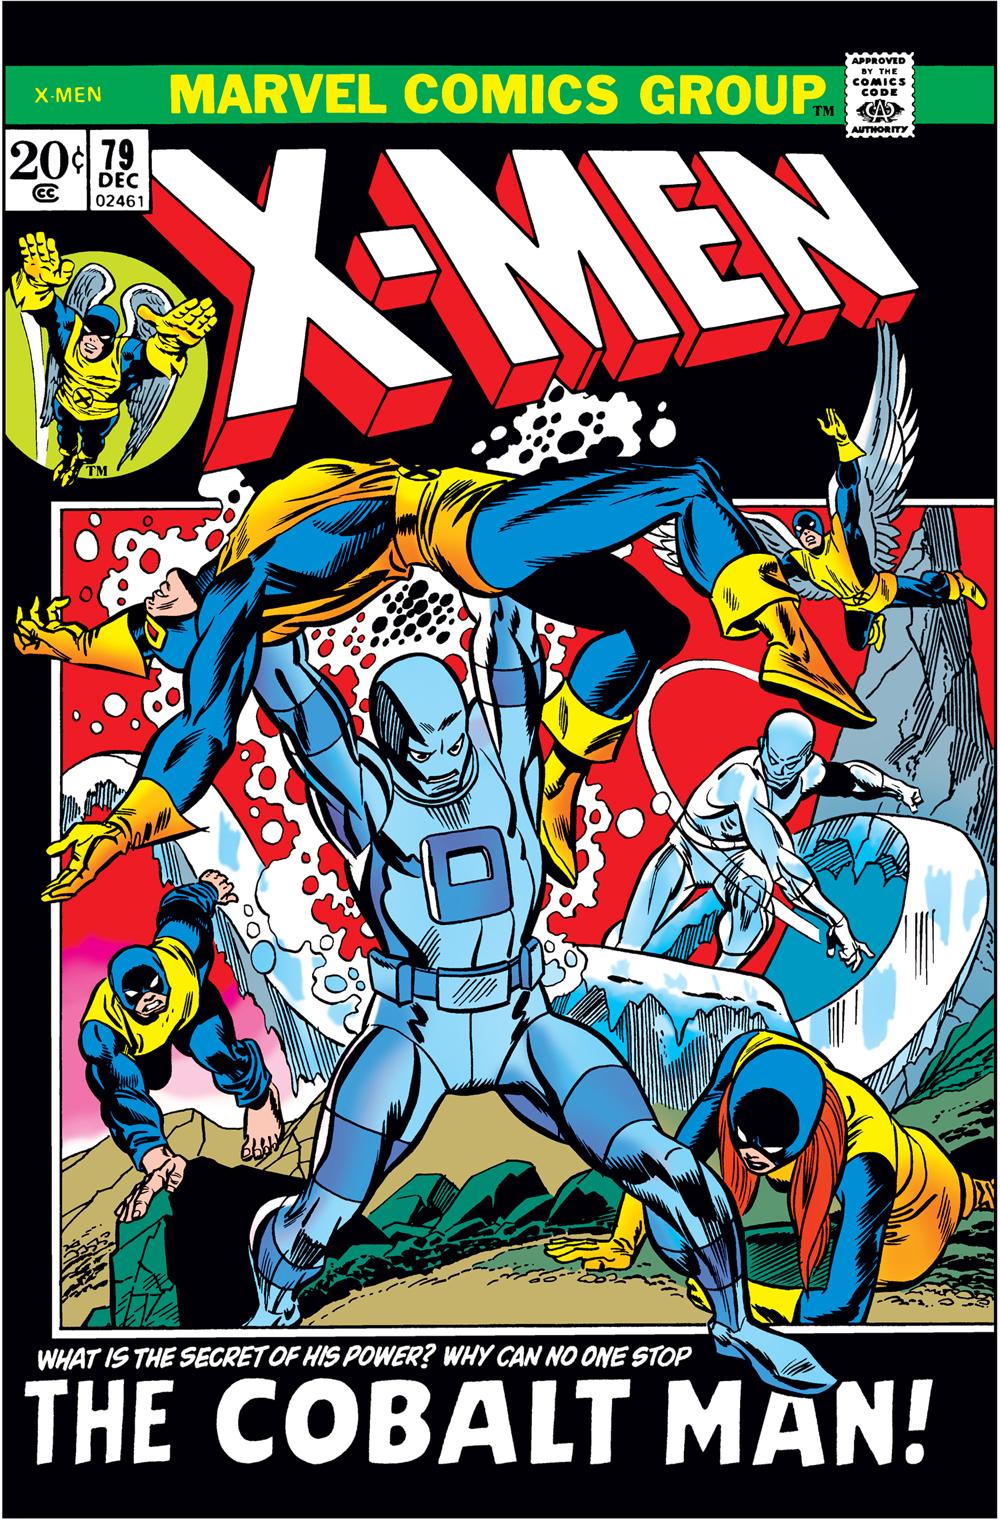 Uncanny X-Men (1963) #79